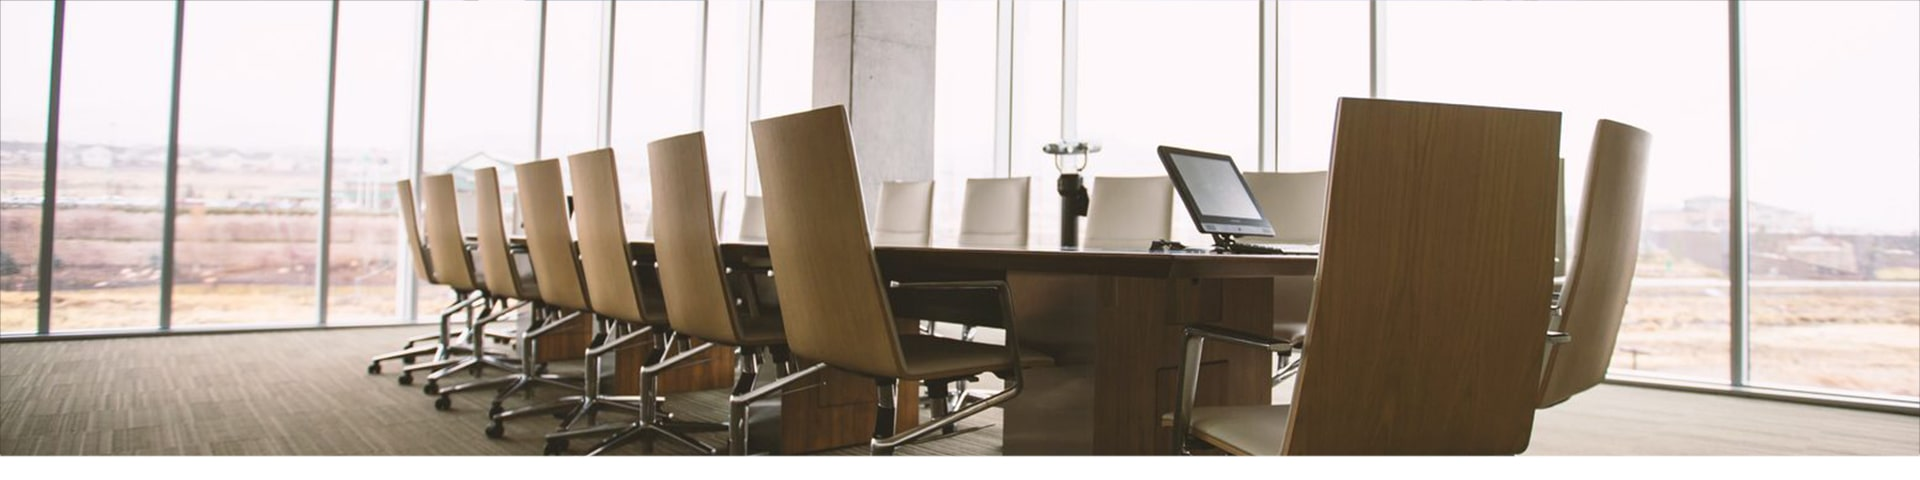 promwad office panorama